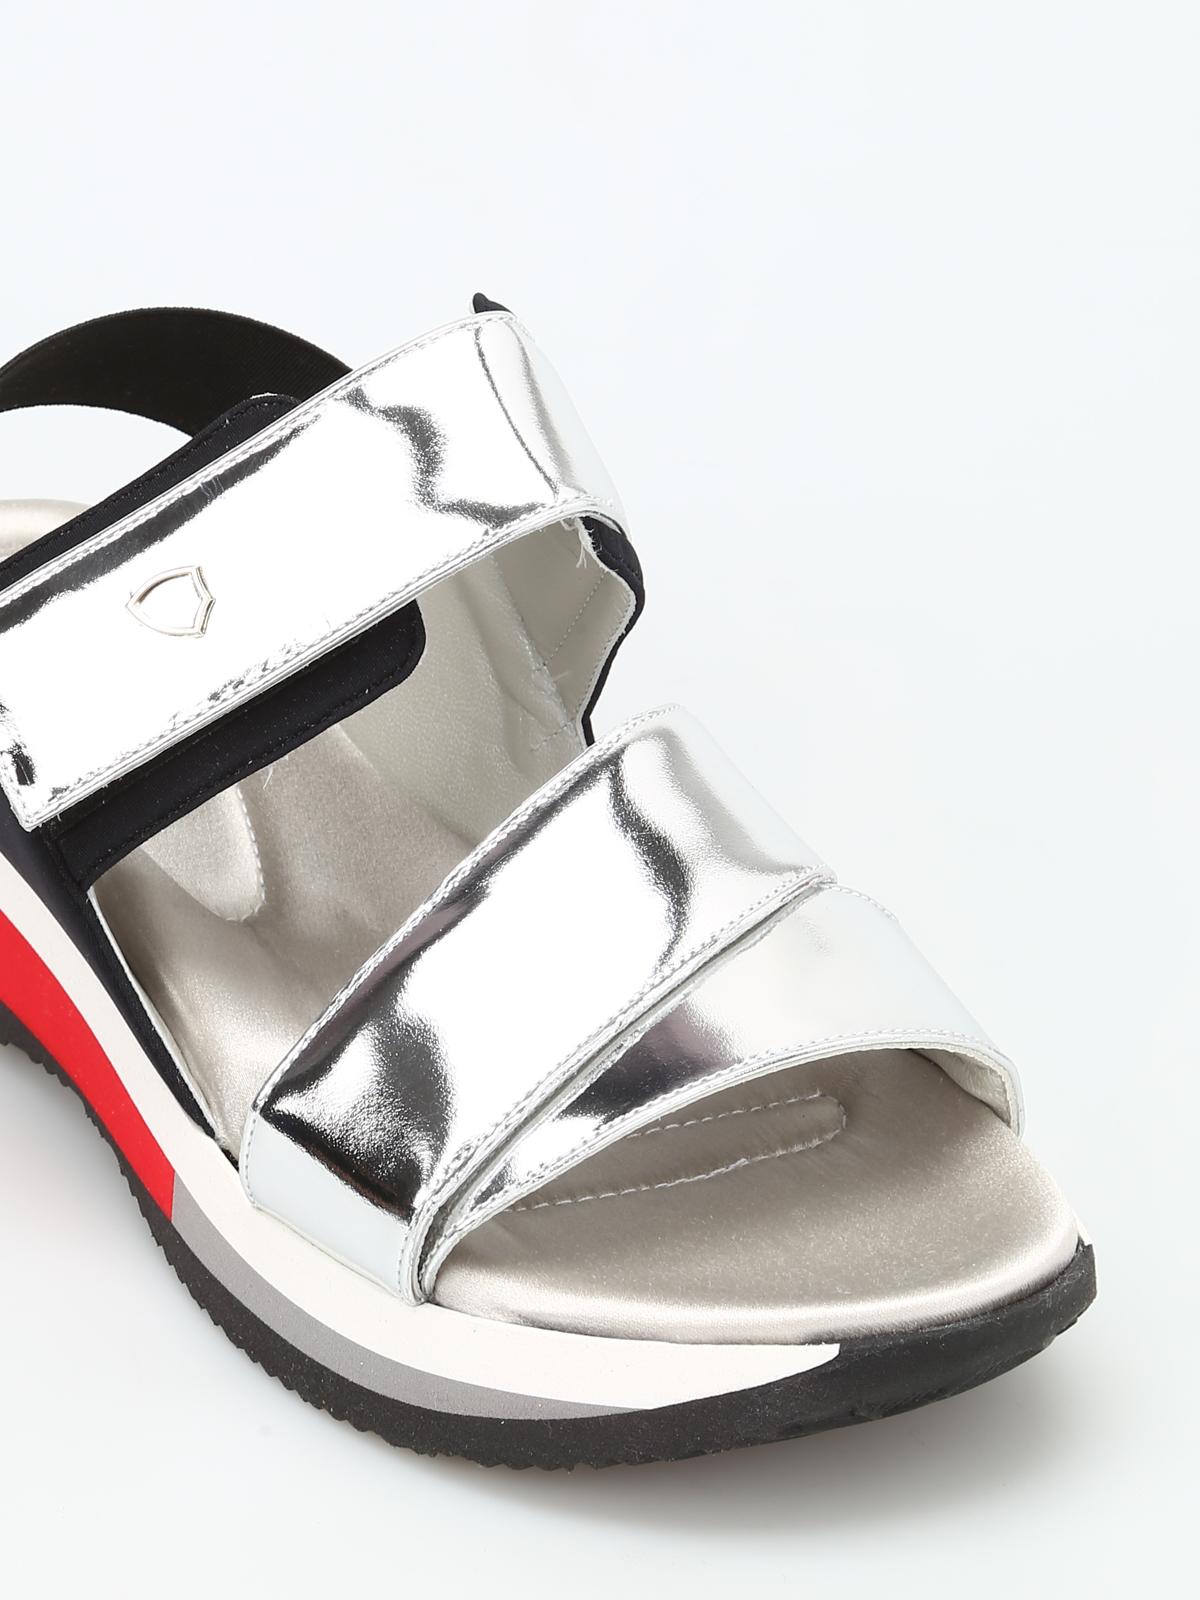 Philippe model Sandals BpL553E